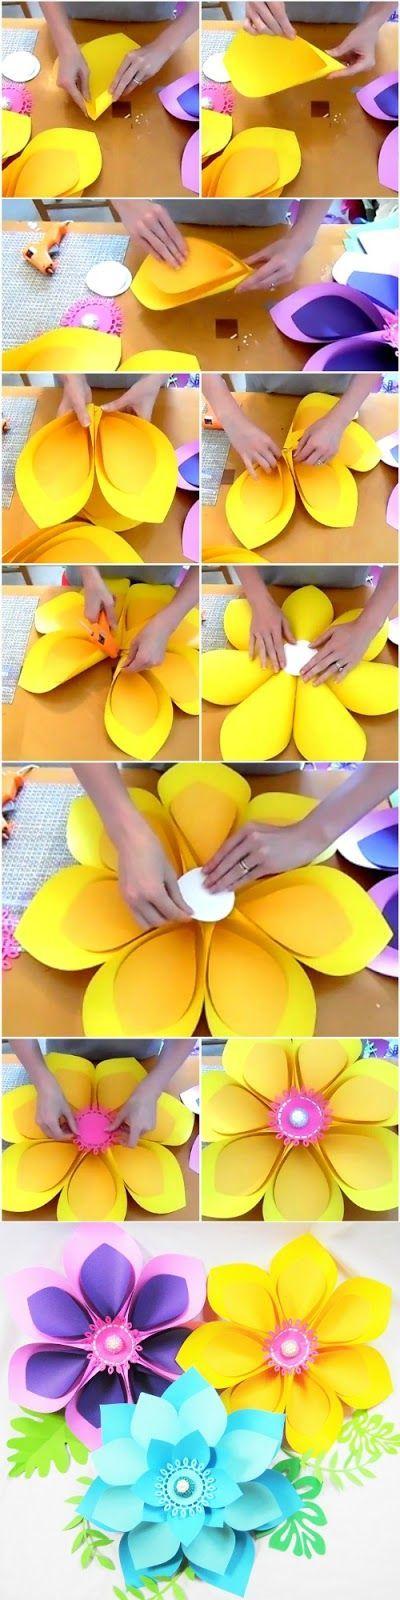 flores de papel para decorar cumpleaos de moana para cumpleaos